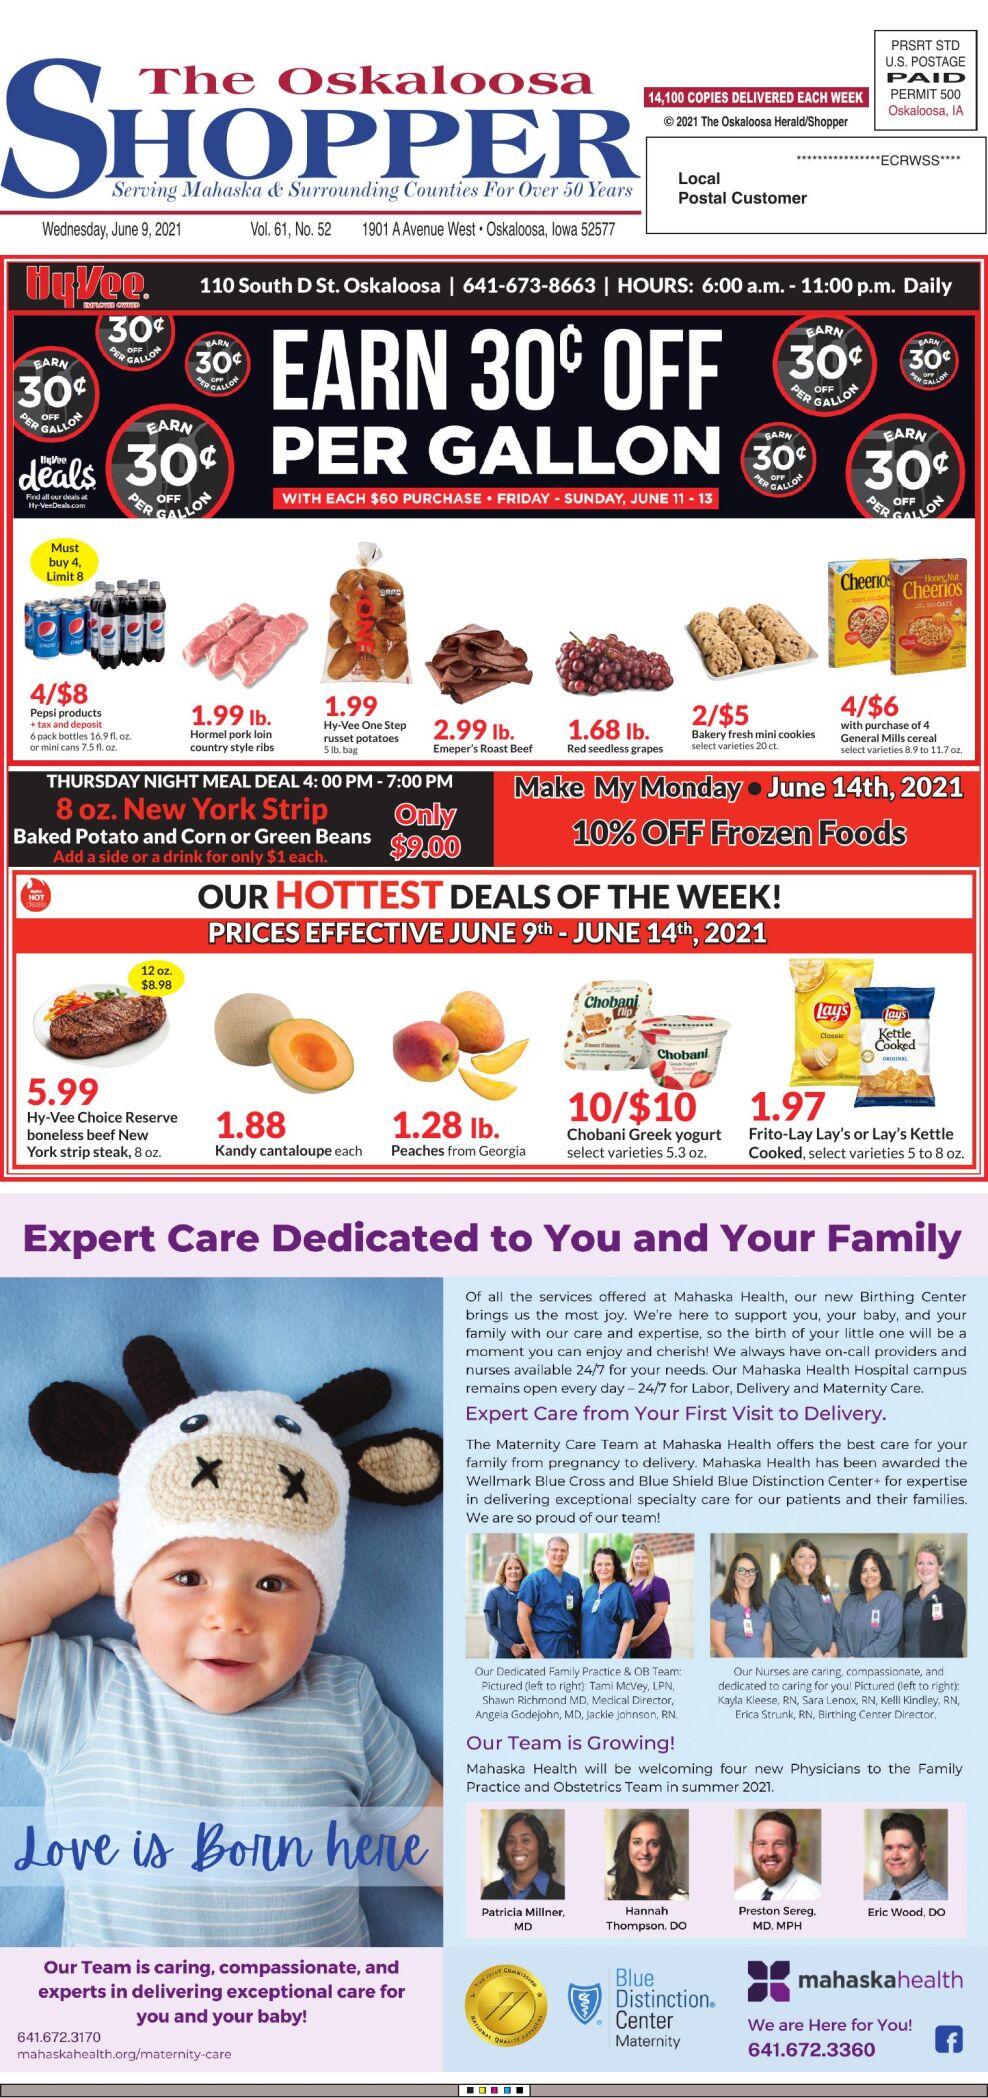 The Oskaloosa Shopper week of 06/09/21